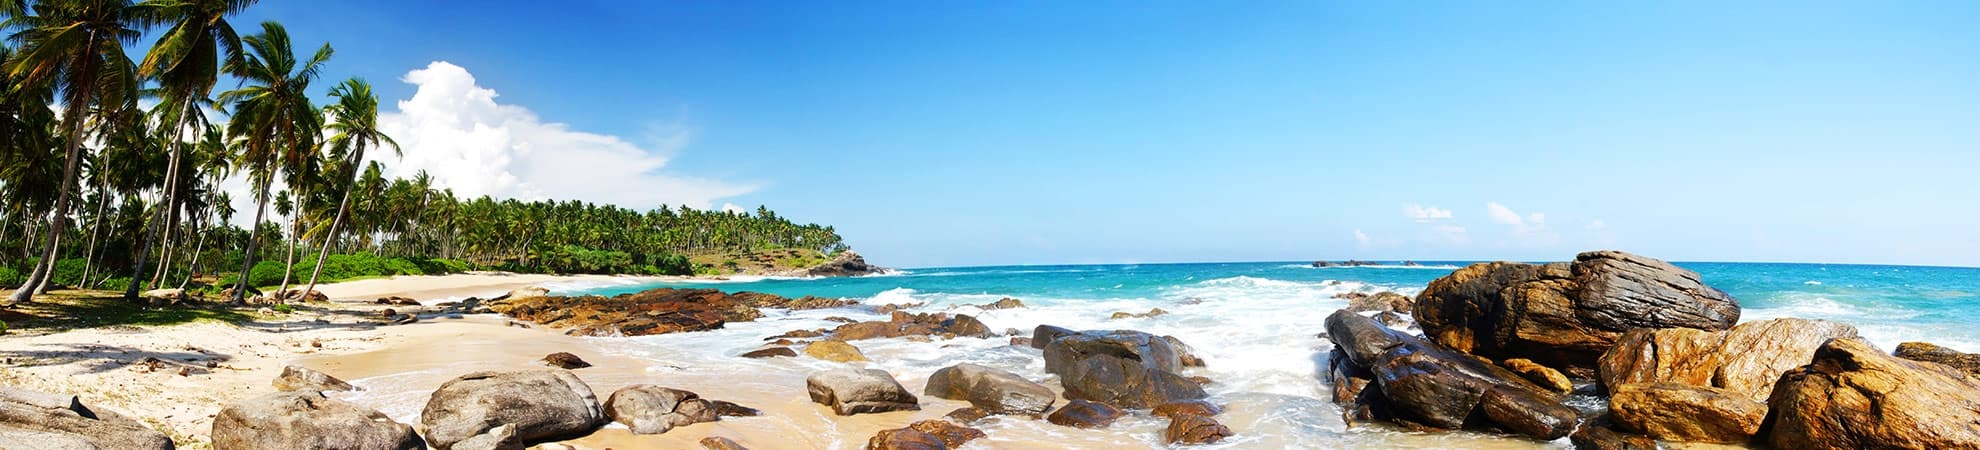 Tous nos voyages privatifs au Sri Lanka